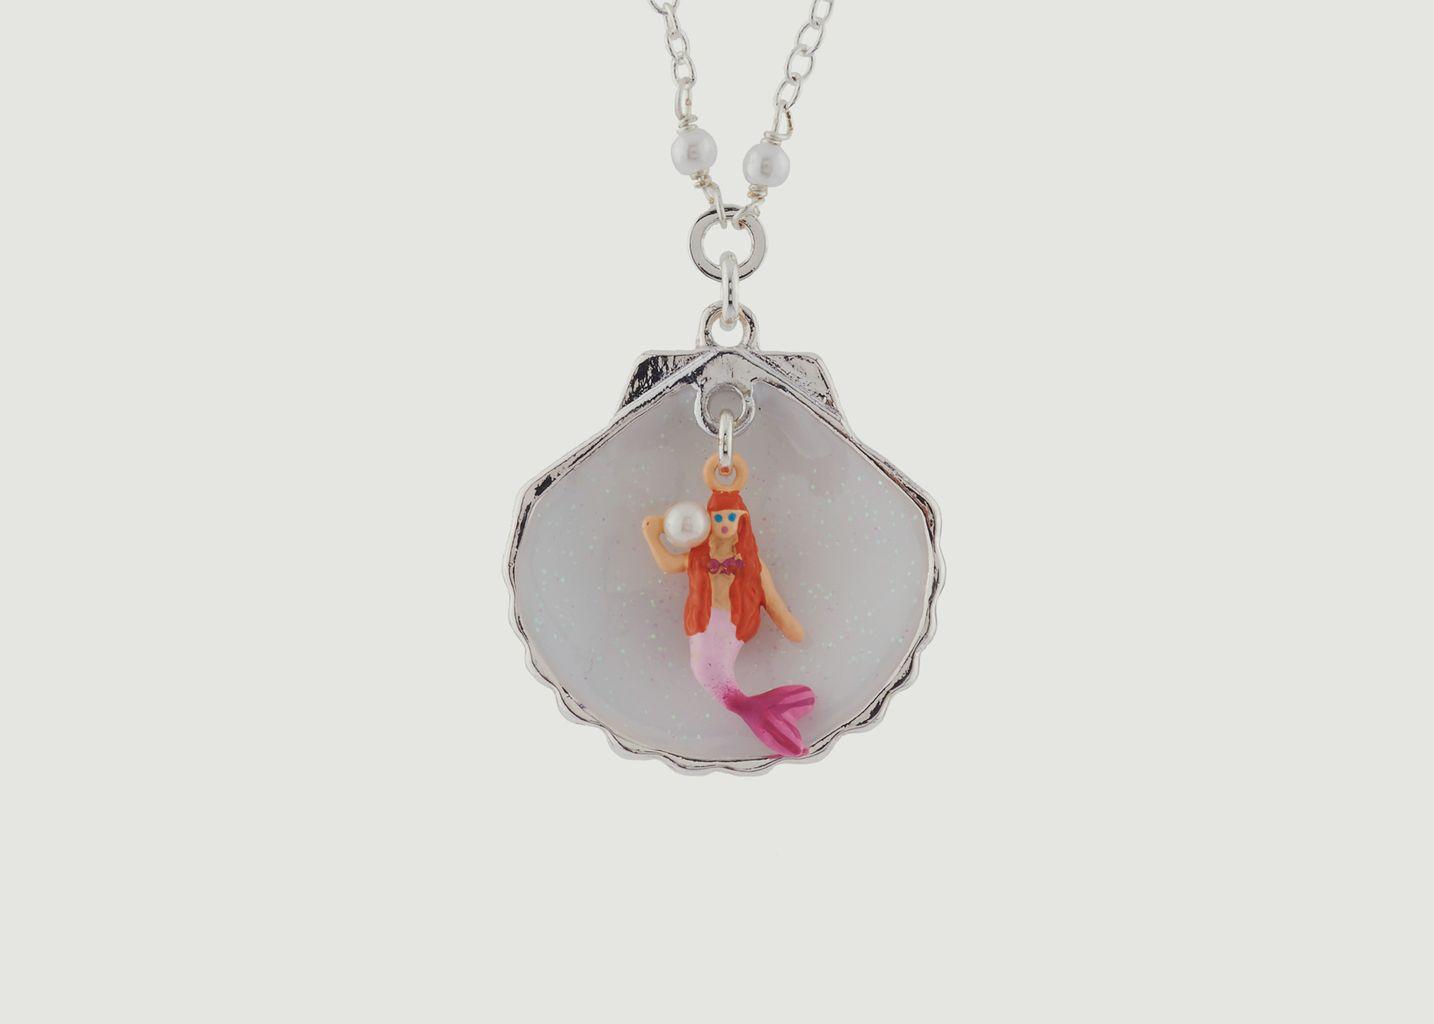 Collier Petite Sirène Dans Son Coquillage - N2